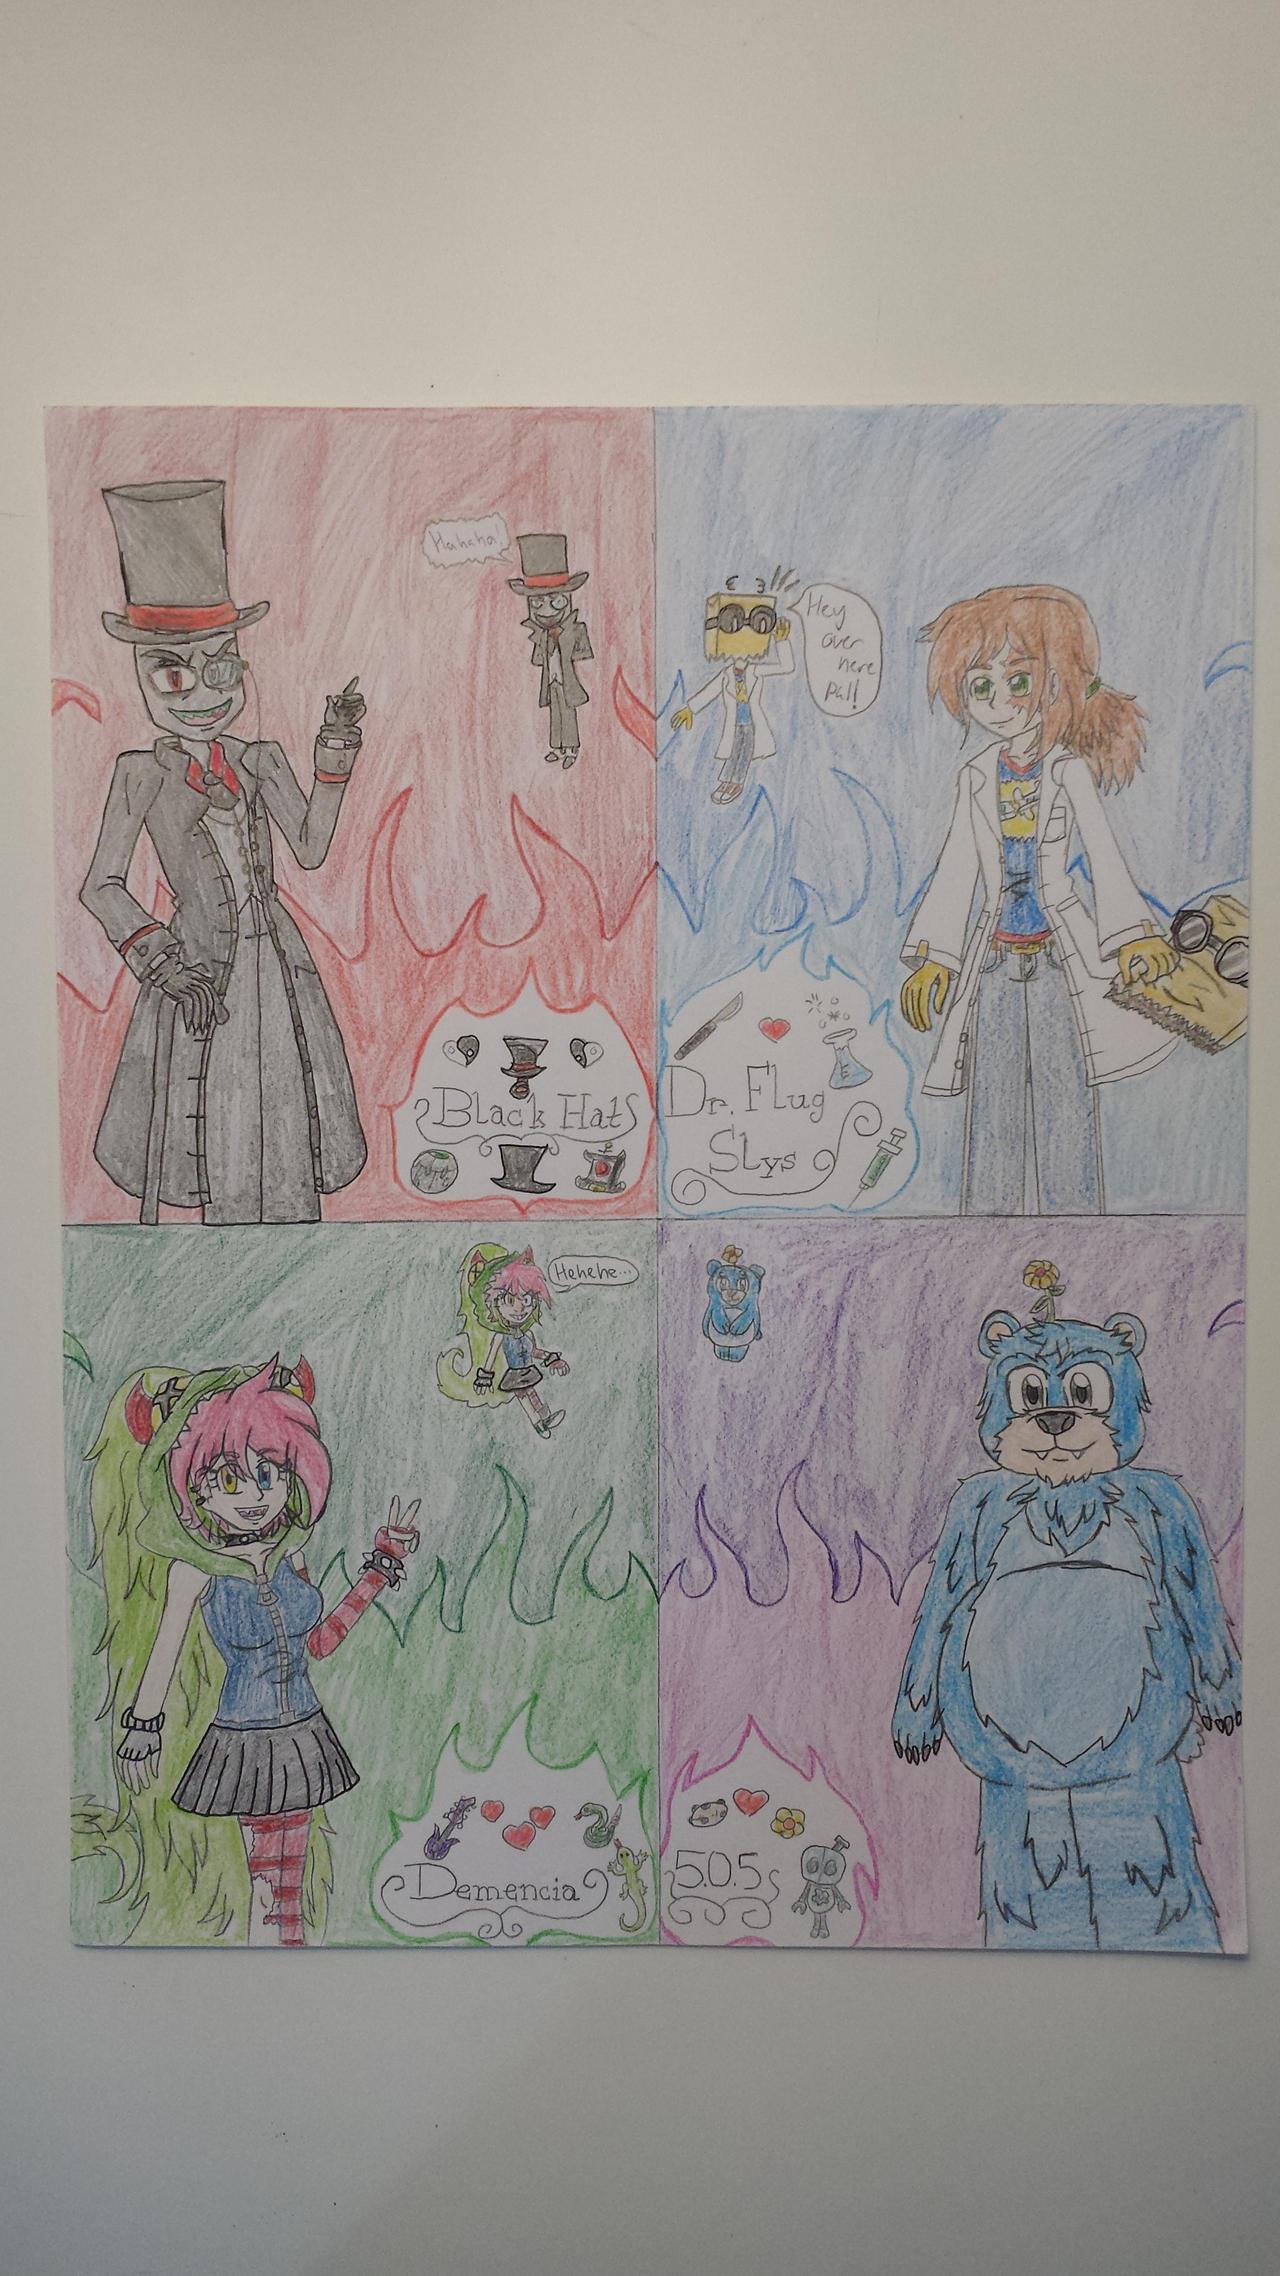 Cartoon Network Fusionfall Villainous By Animeria On Deviantart